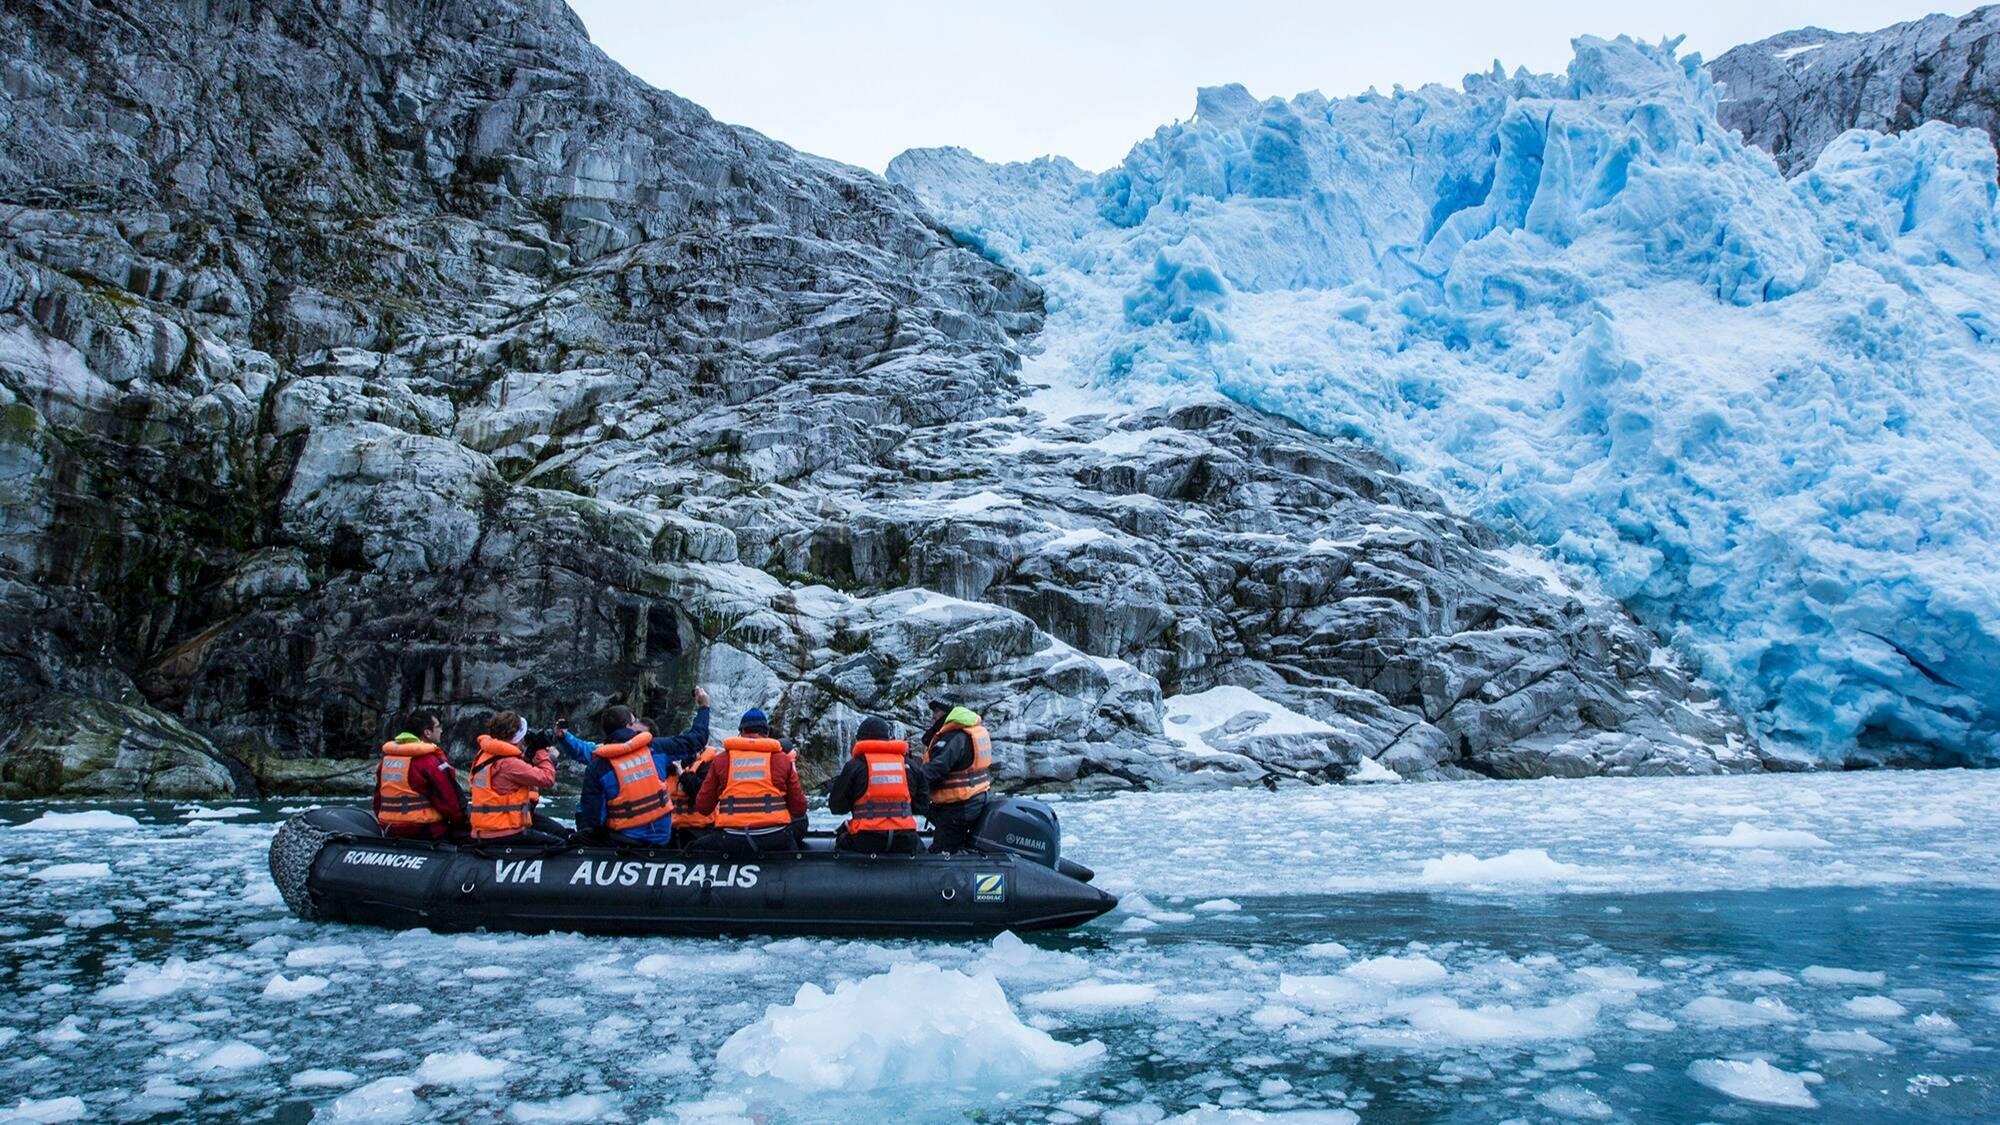 Circuit Chili Croisiere Australis Patagonie Excursion Glacier